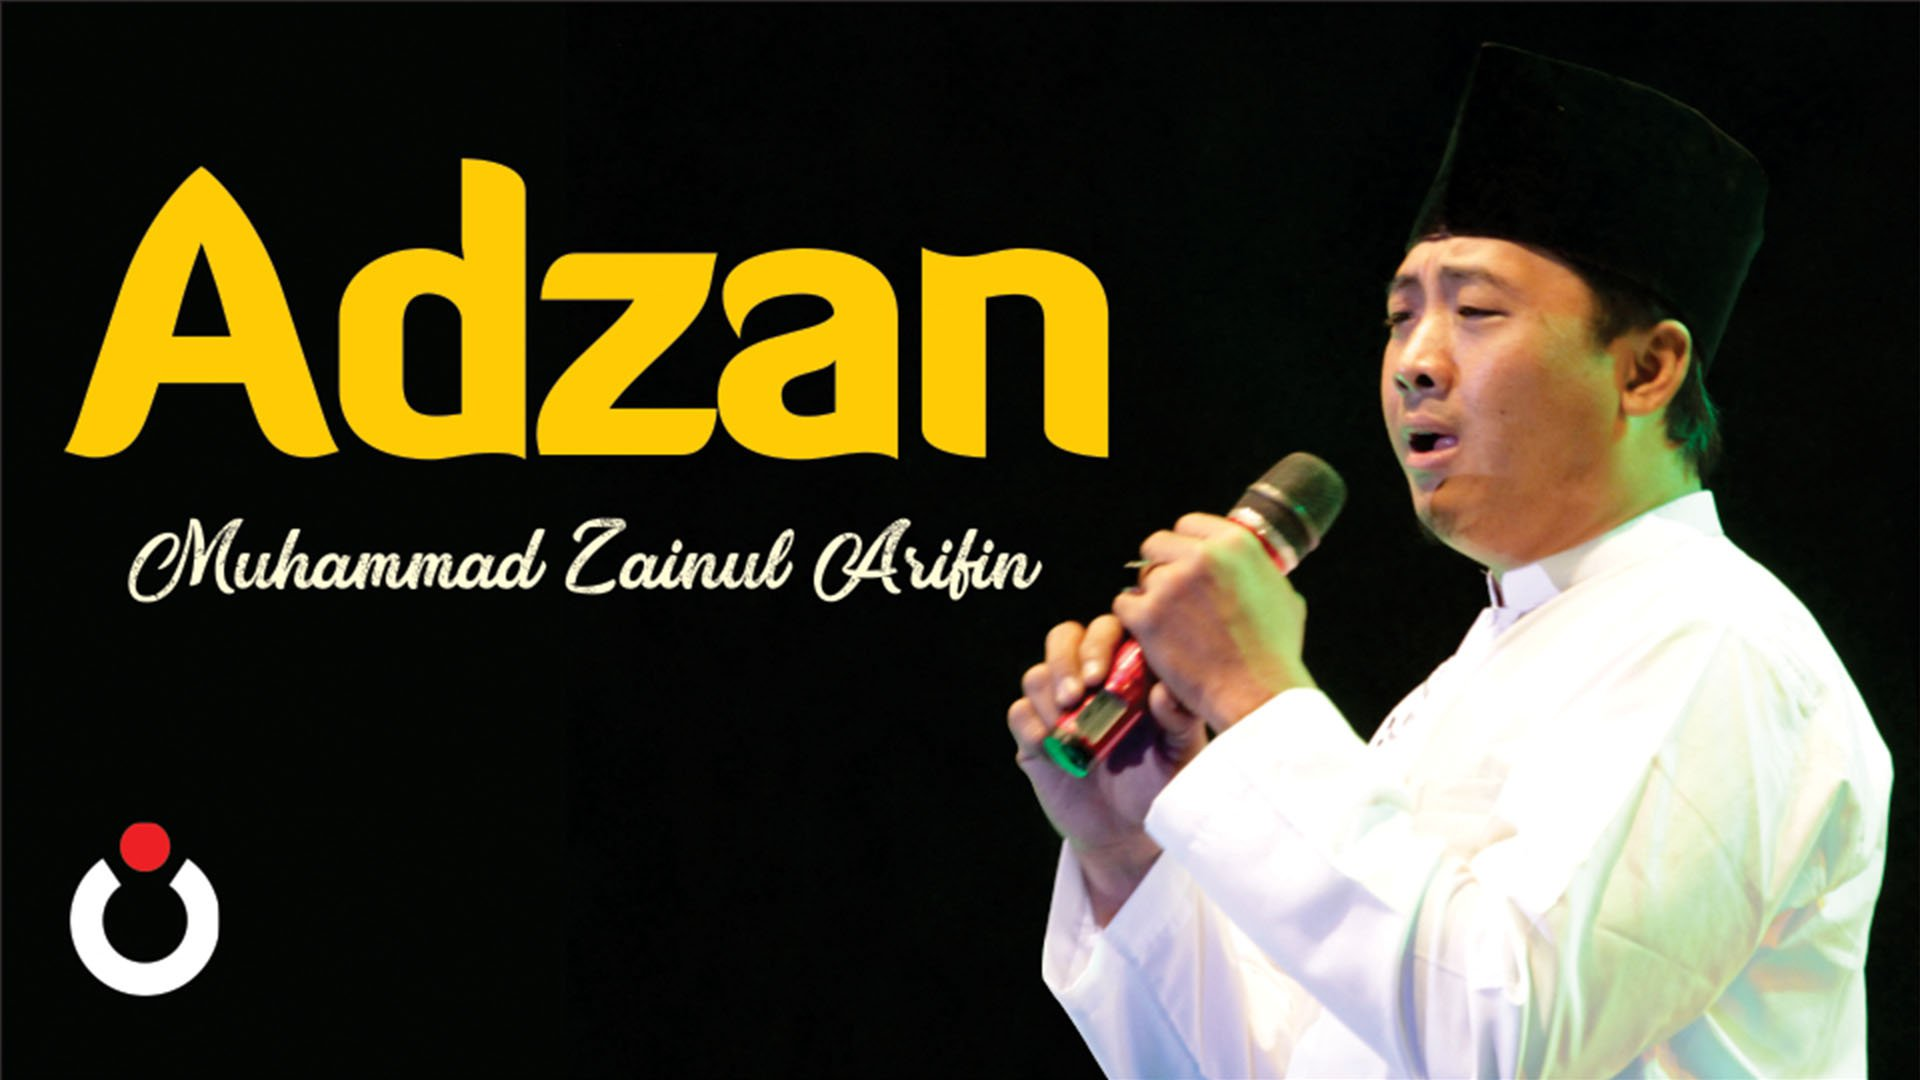 Adzan, oleh Muhammad Zainul Arifin